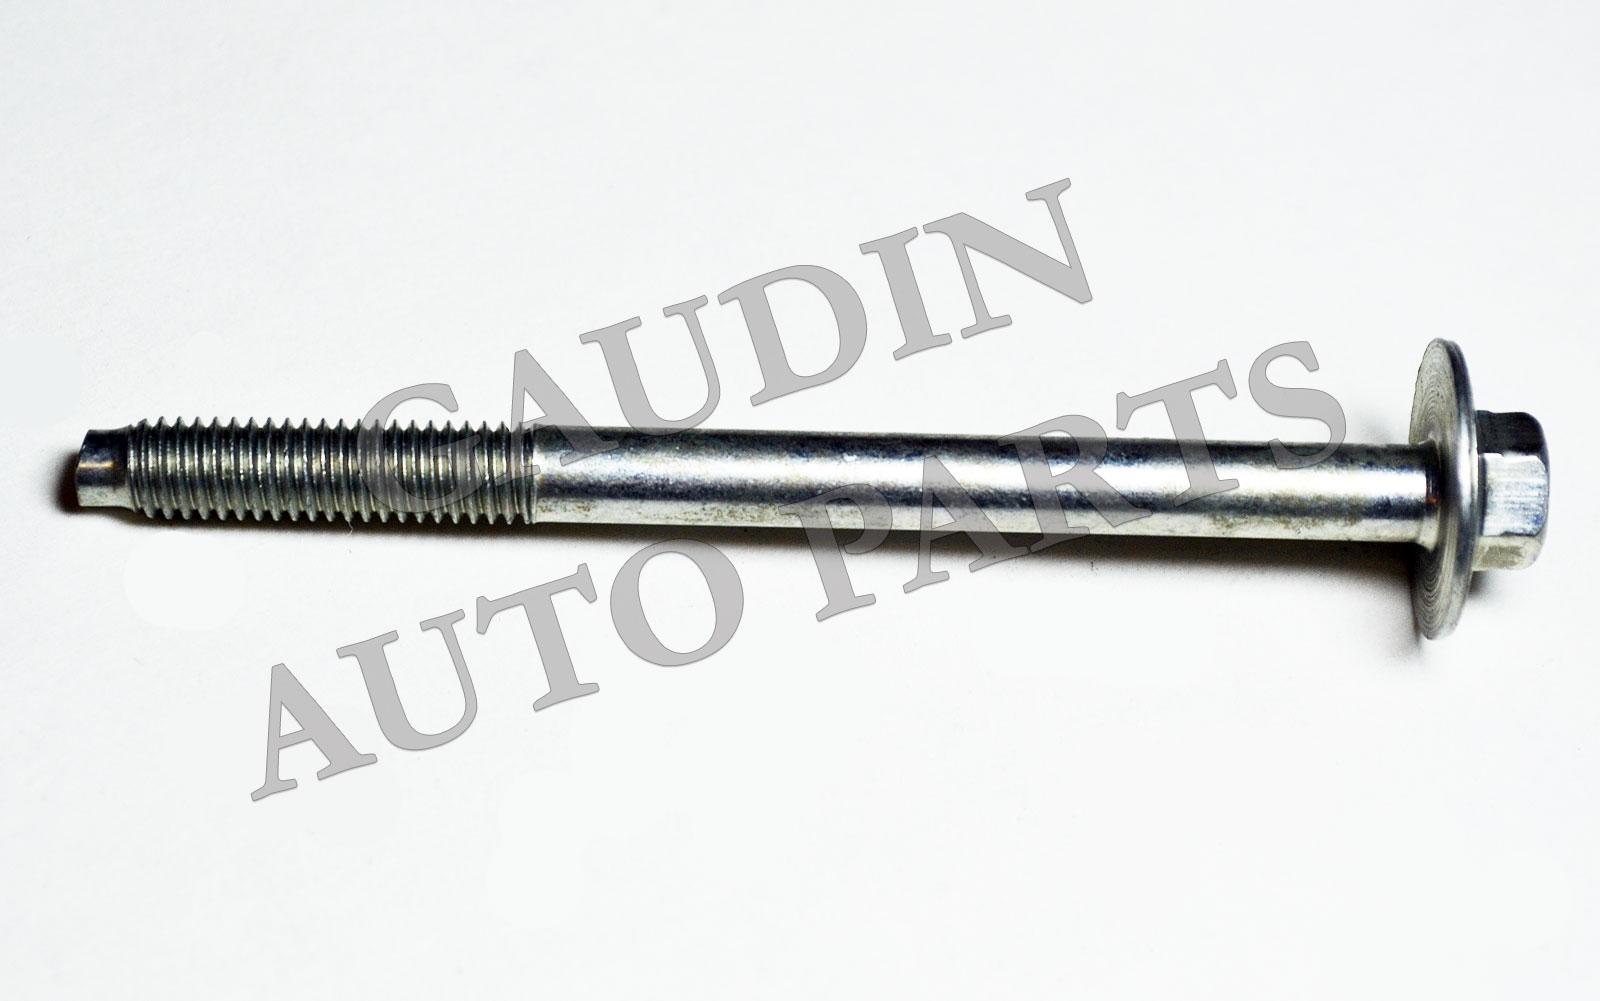 Ford Oem 02 10 Explorer 4 0l V6 Water Pump Upper Housing Bolt W S437